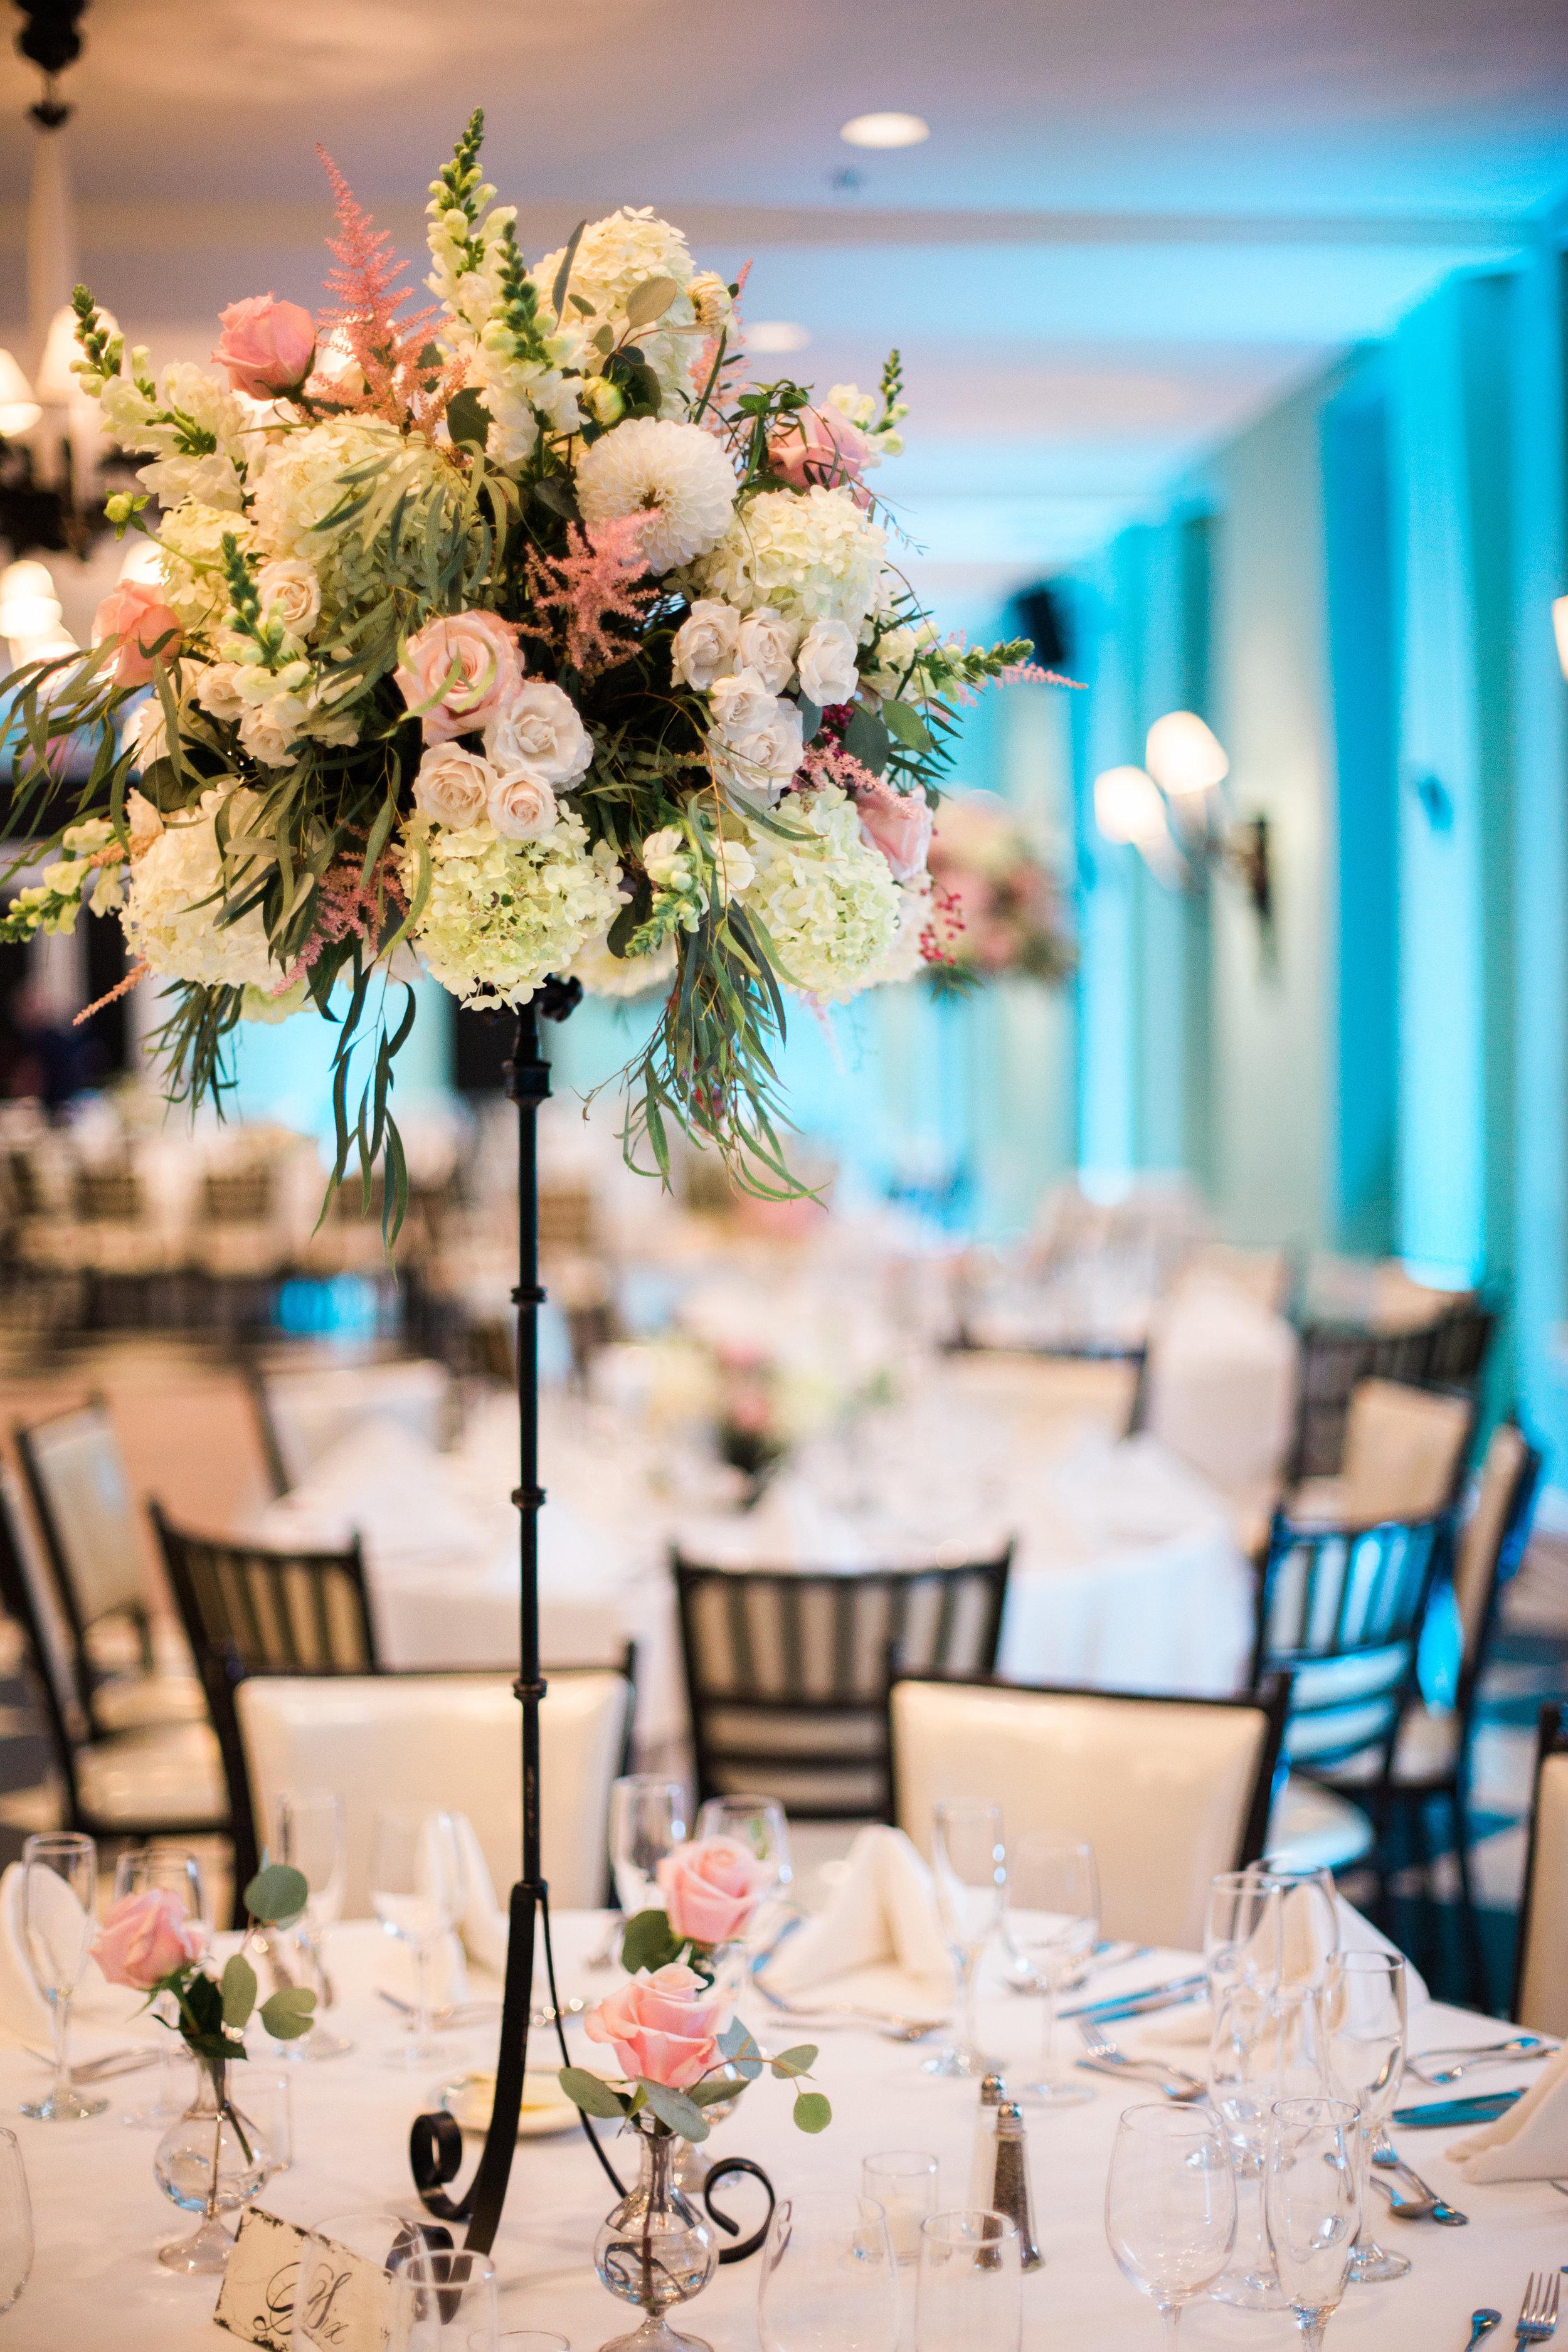 Cape May Wedding, Congress Hall, Cape Resort Weddings, White and Blush, Centerpiece, Hudson Nichols Photography